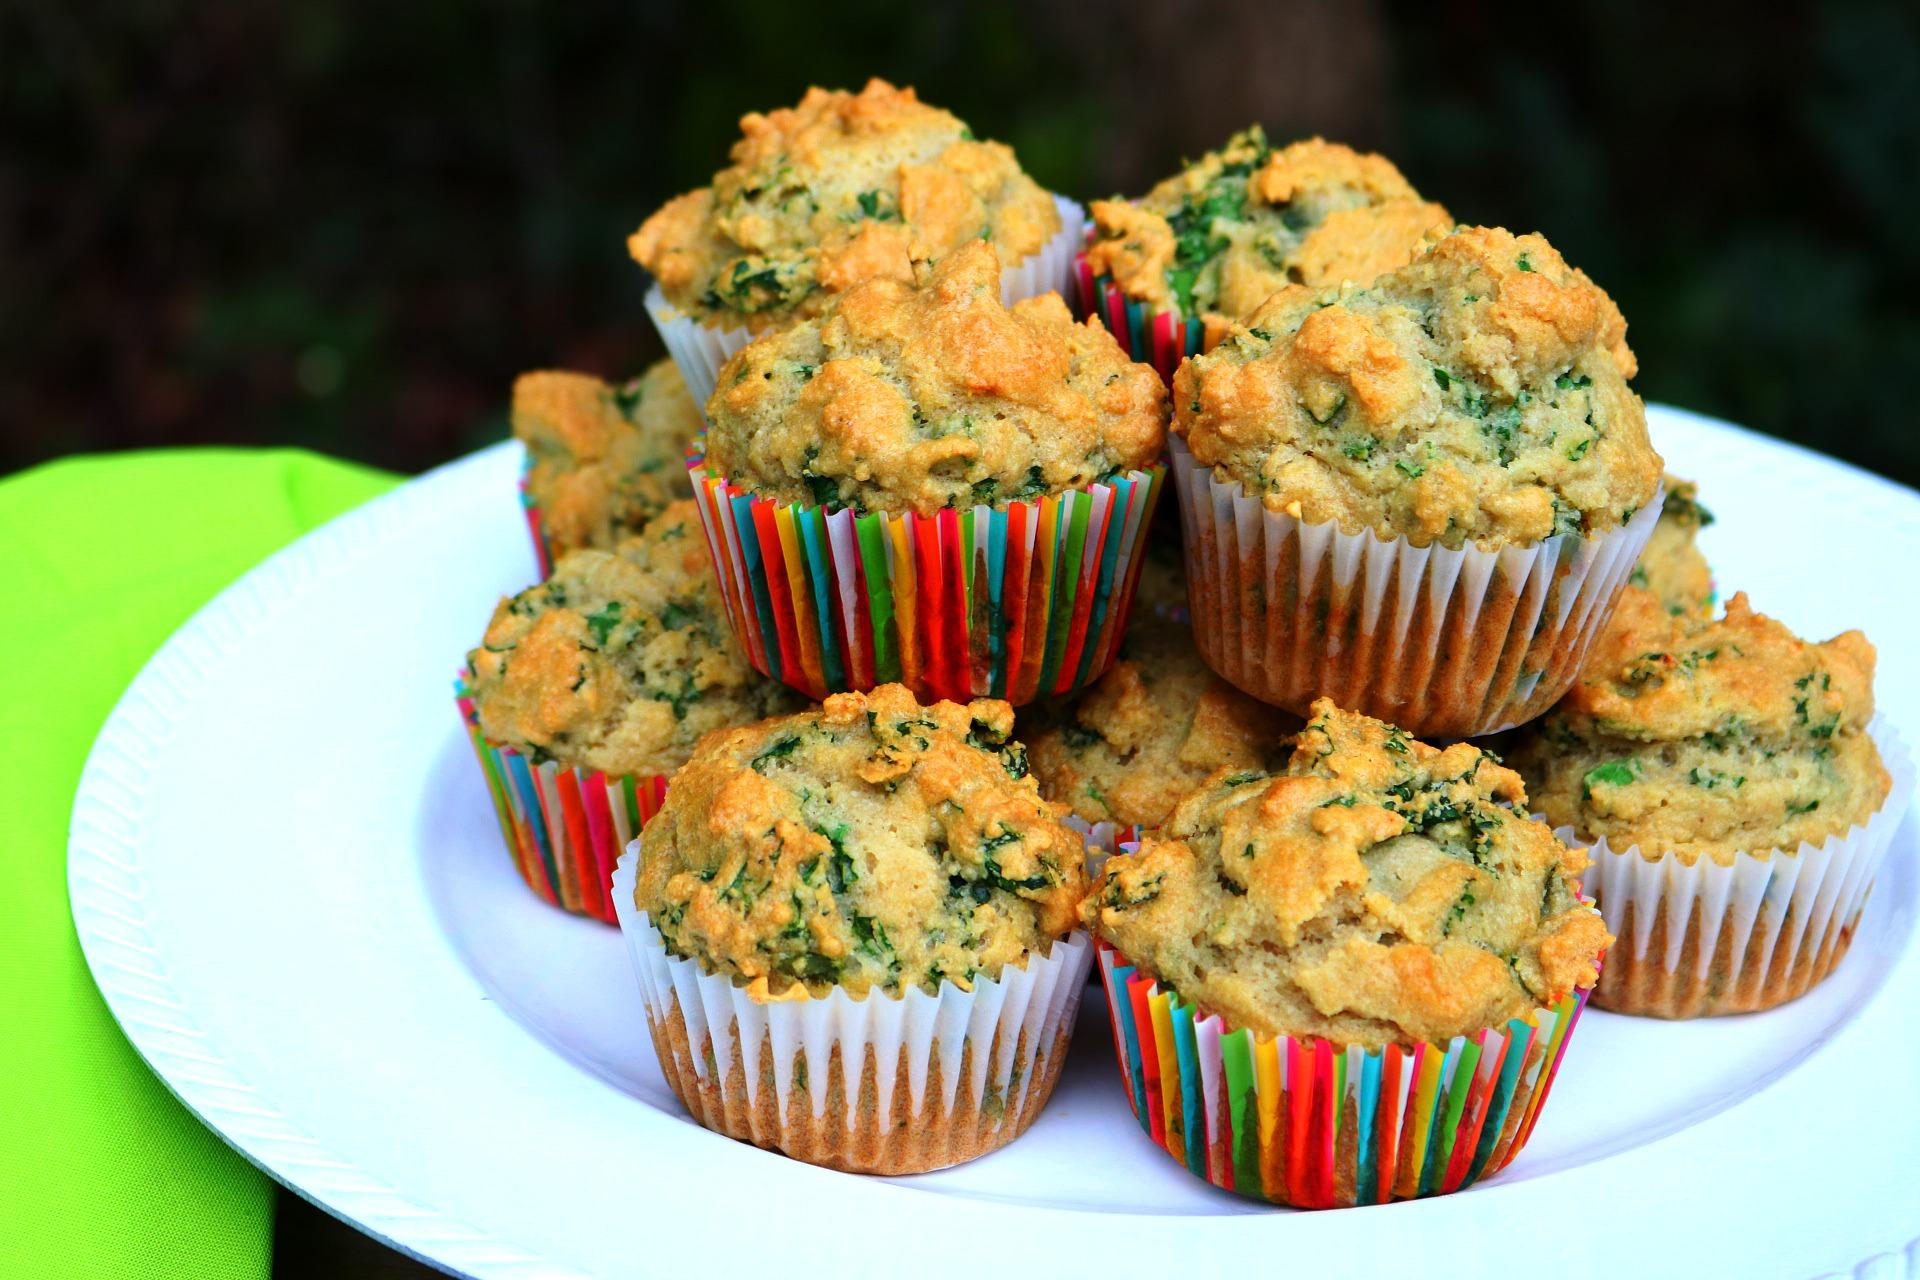 kale muffins1.JPG